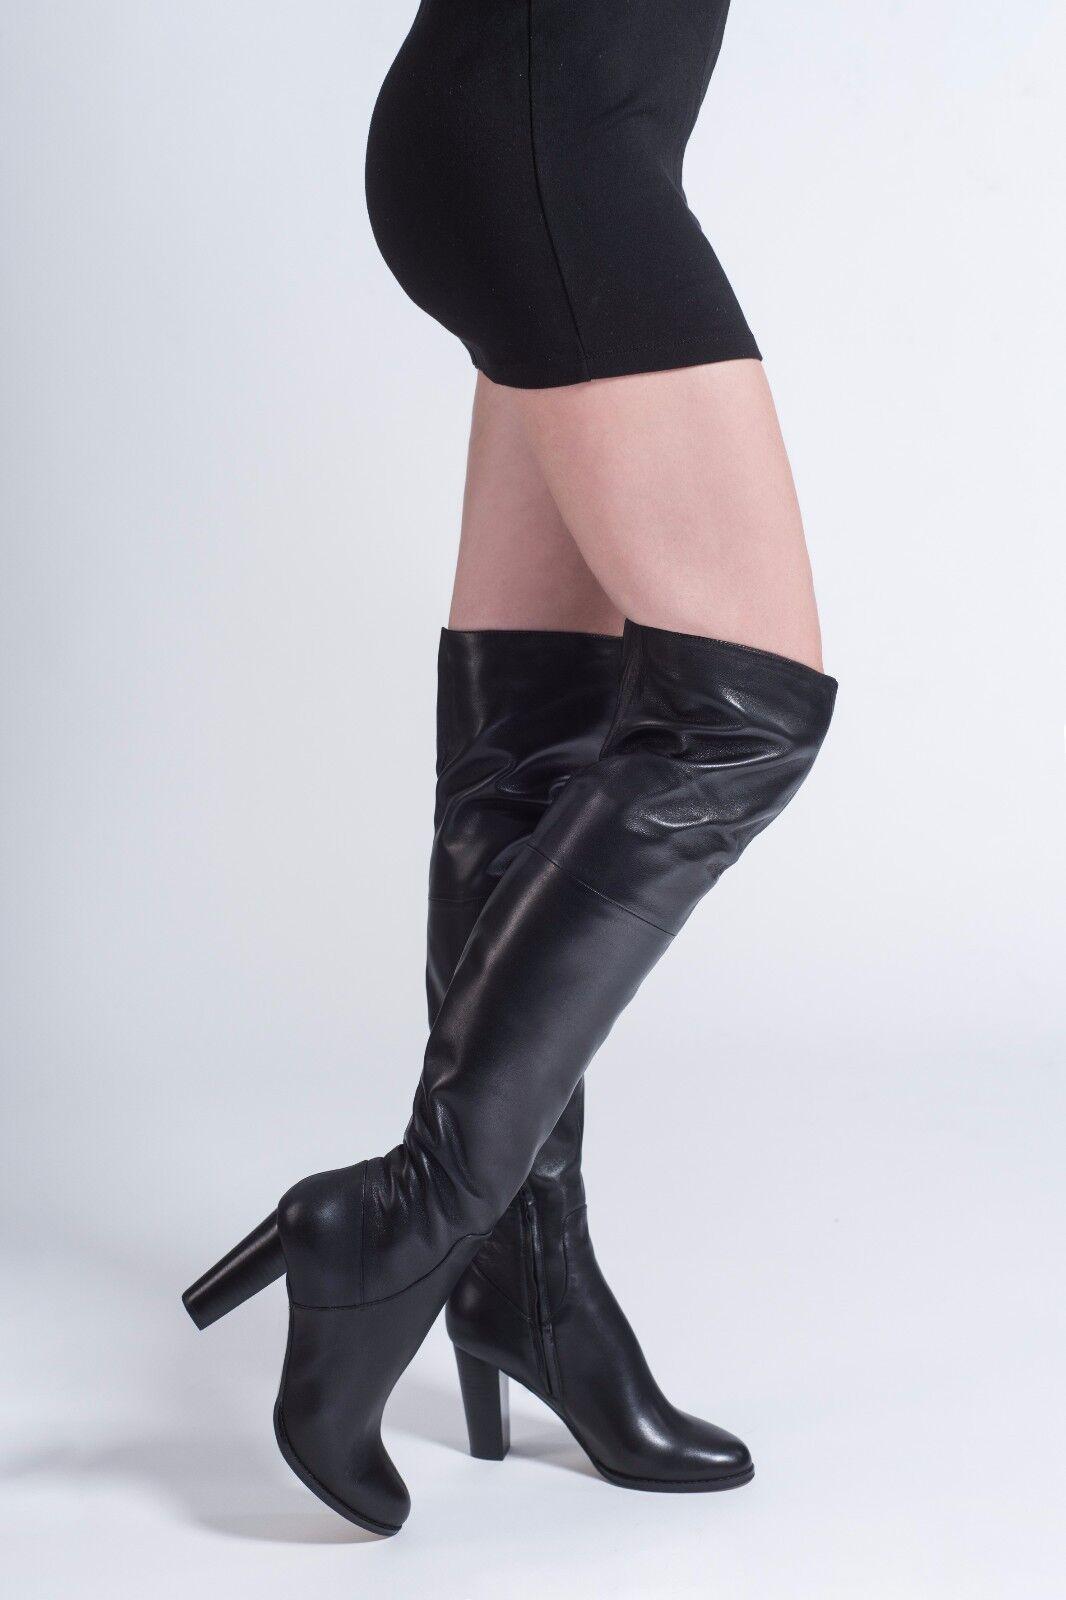 NEU NEU NEU   AROLLO echt Leder Niedrig Heel Overknee Stiefel Victoria Gr. 37,38,39,40,41,42 0f2556